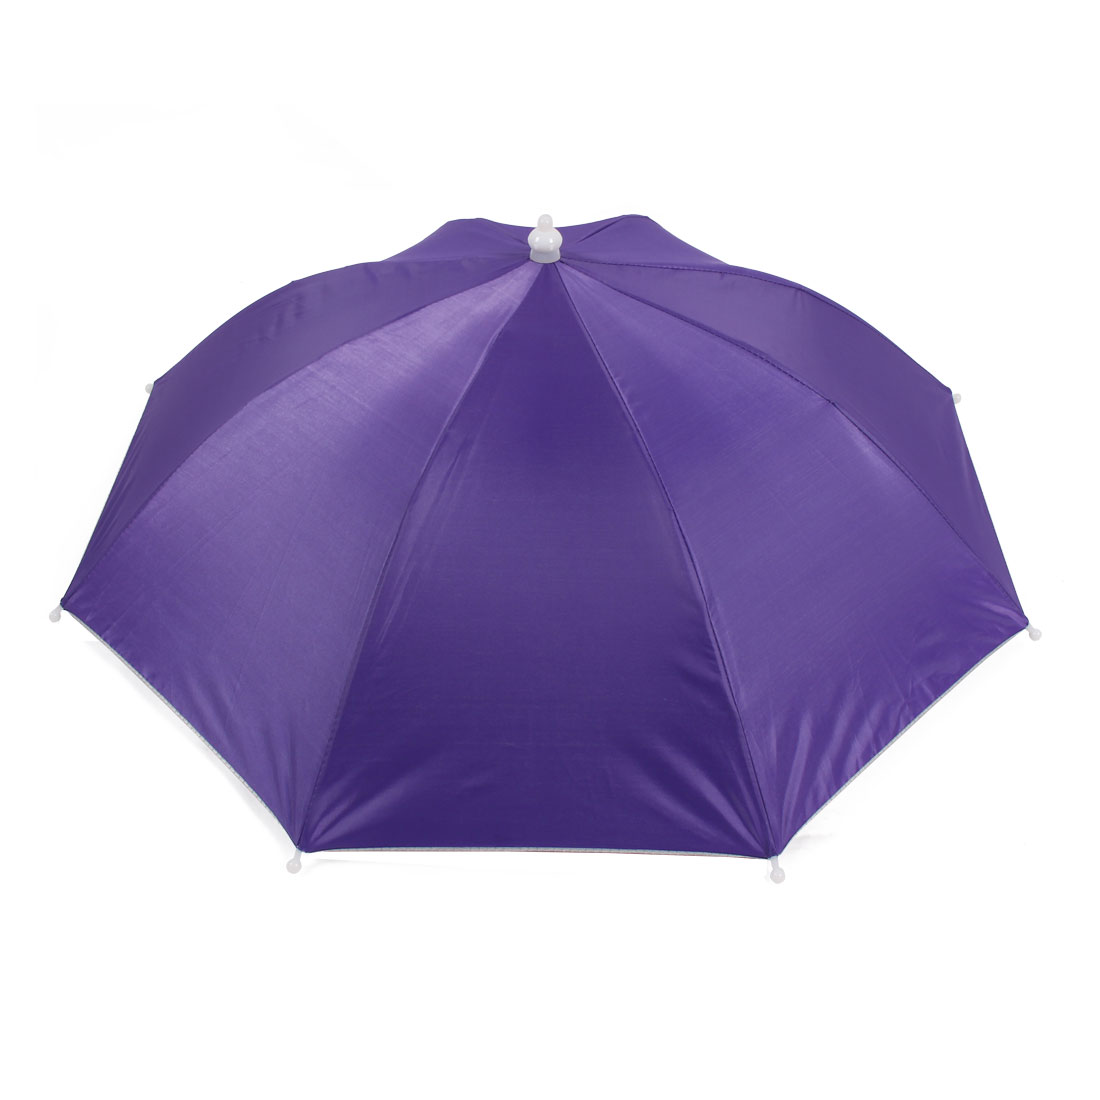 Outdoor Fishing Camping Purple Umbrella Hat Headwear Cap